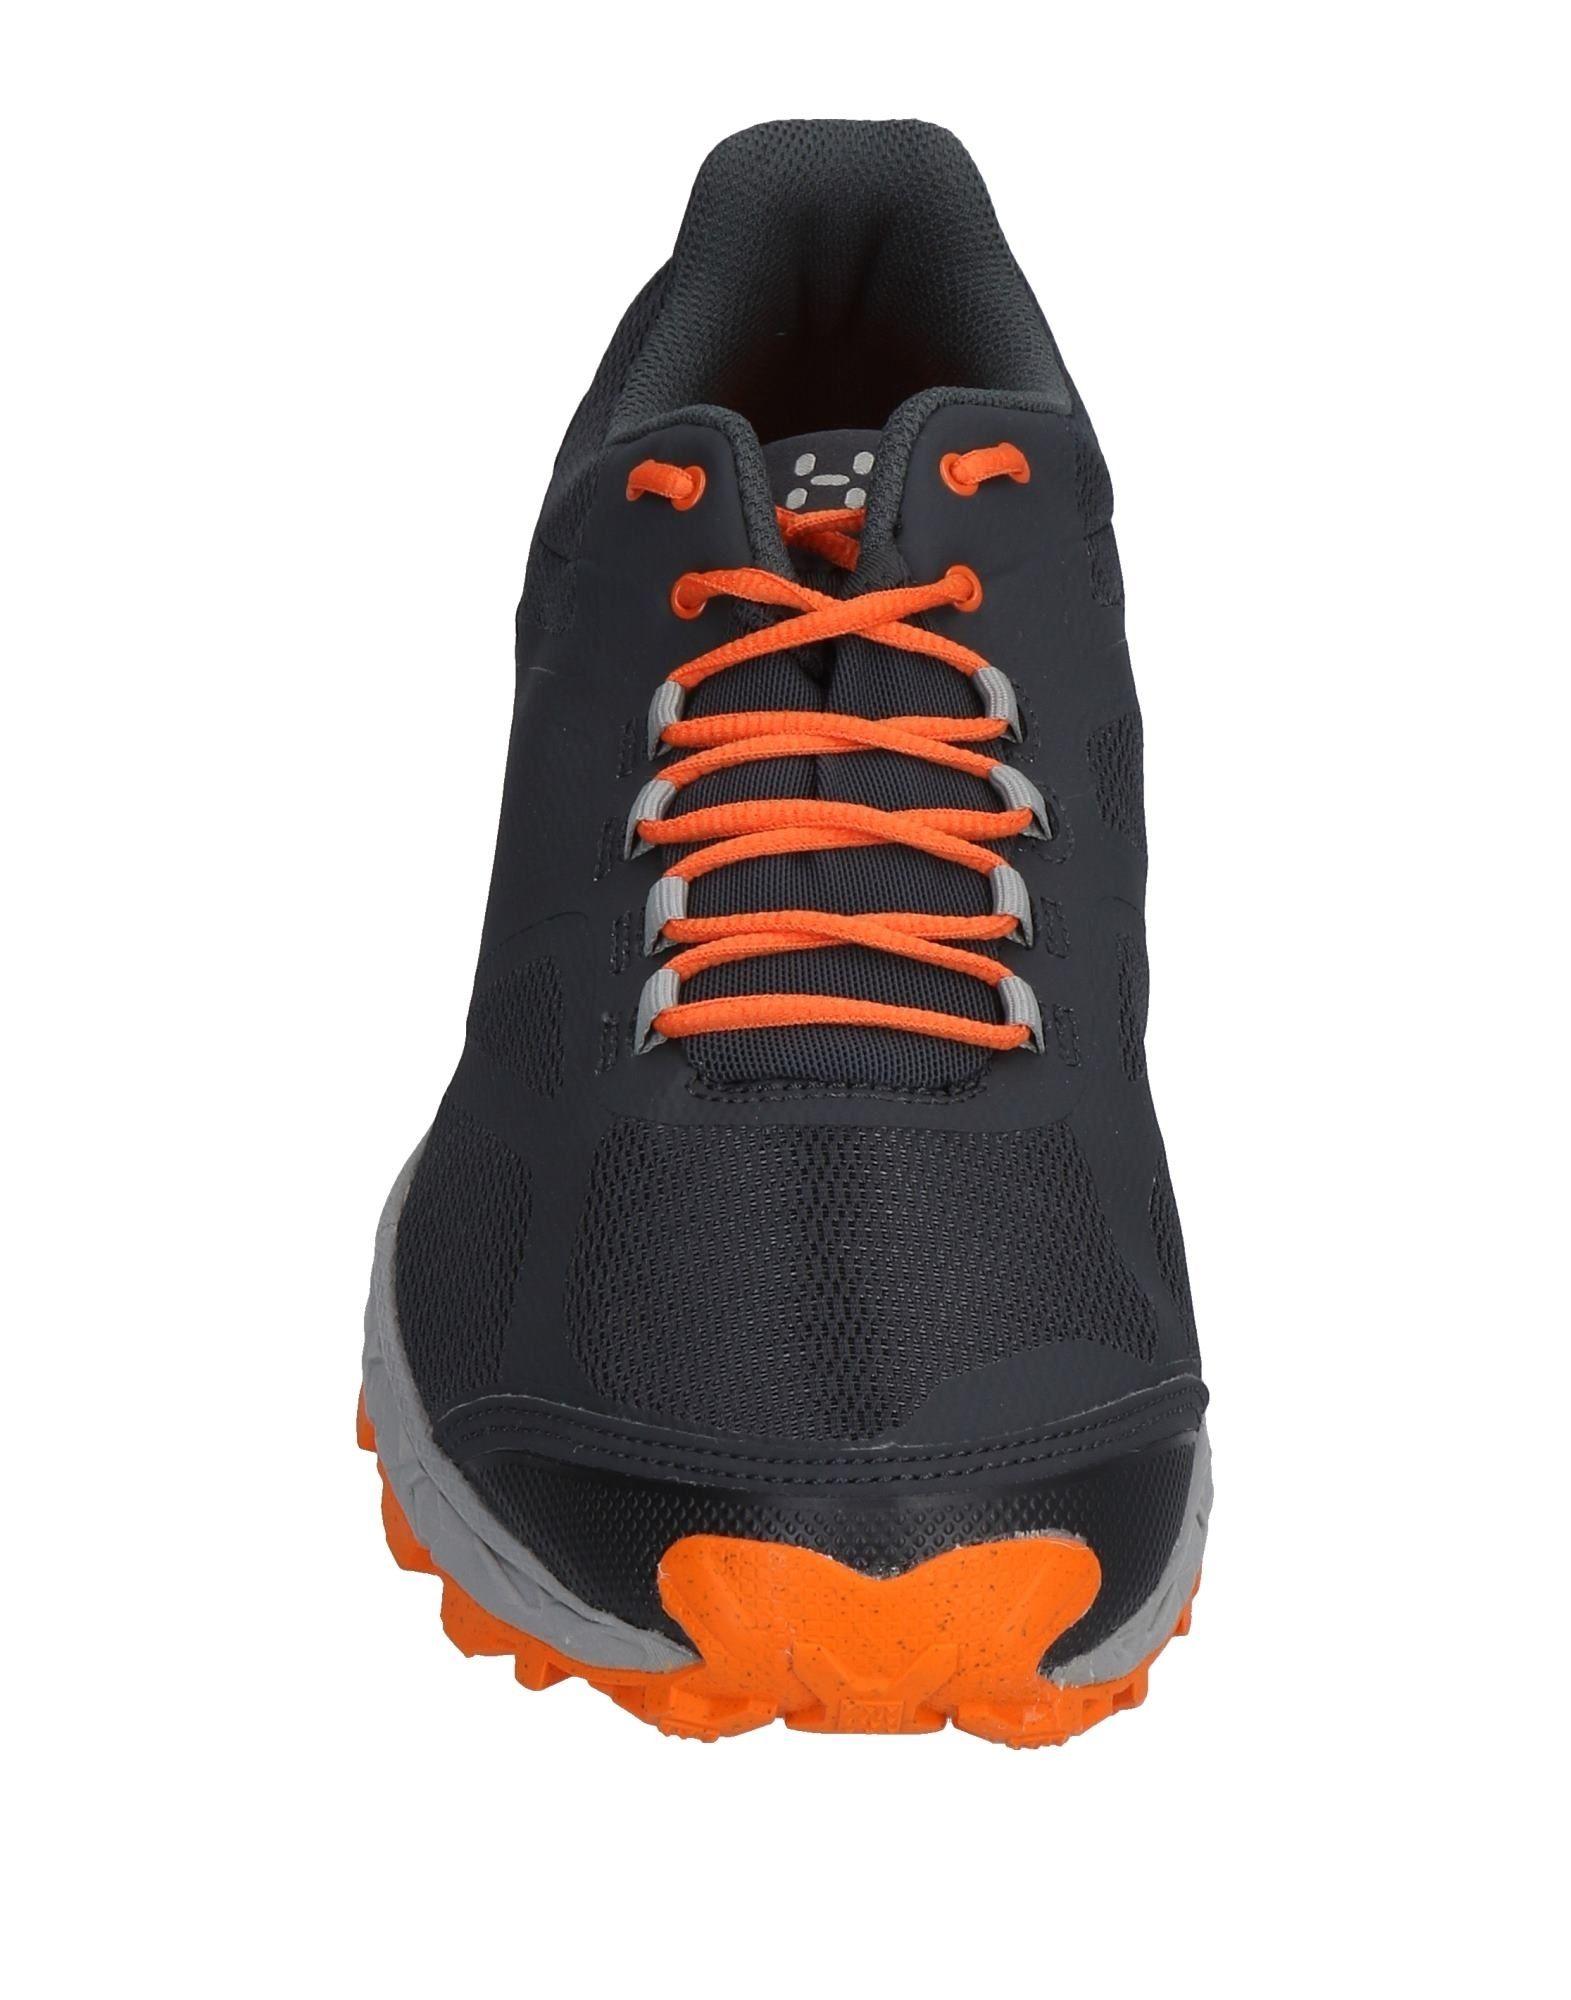 11105130NX Haglöfs Sneakers Herren  11105130NX  Heiße Schuhe 1865c9